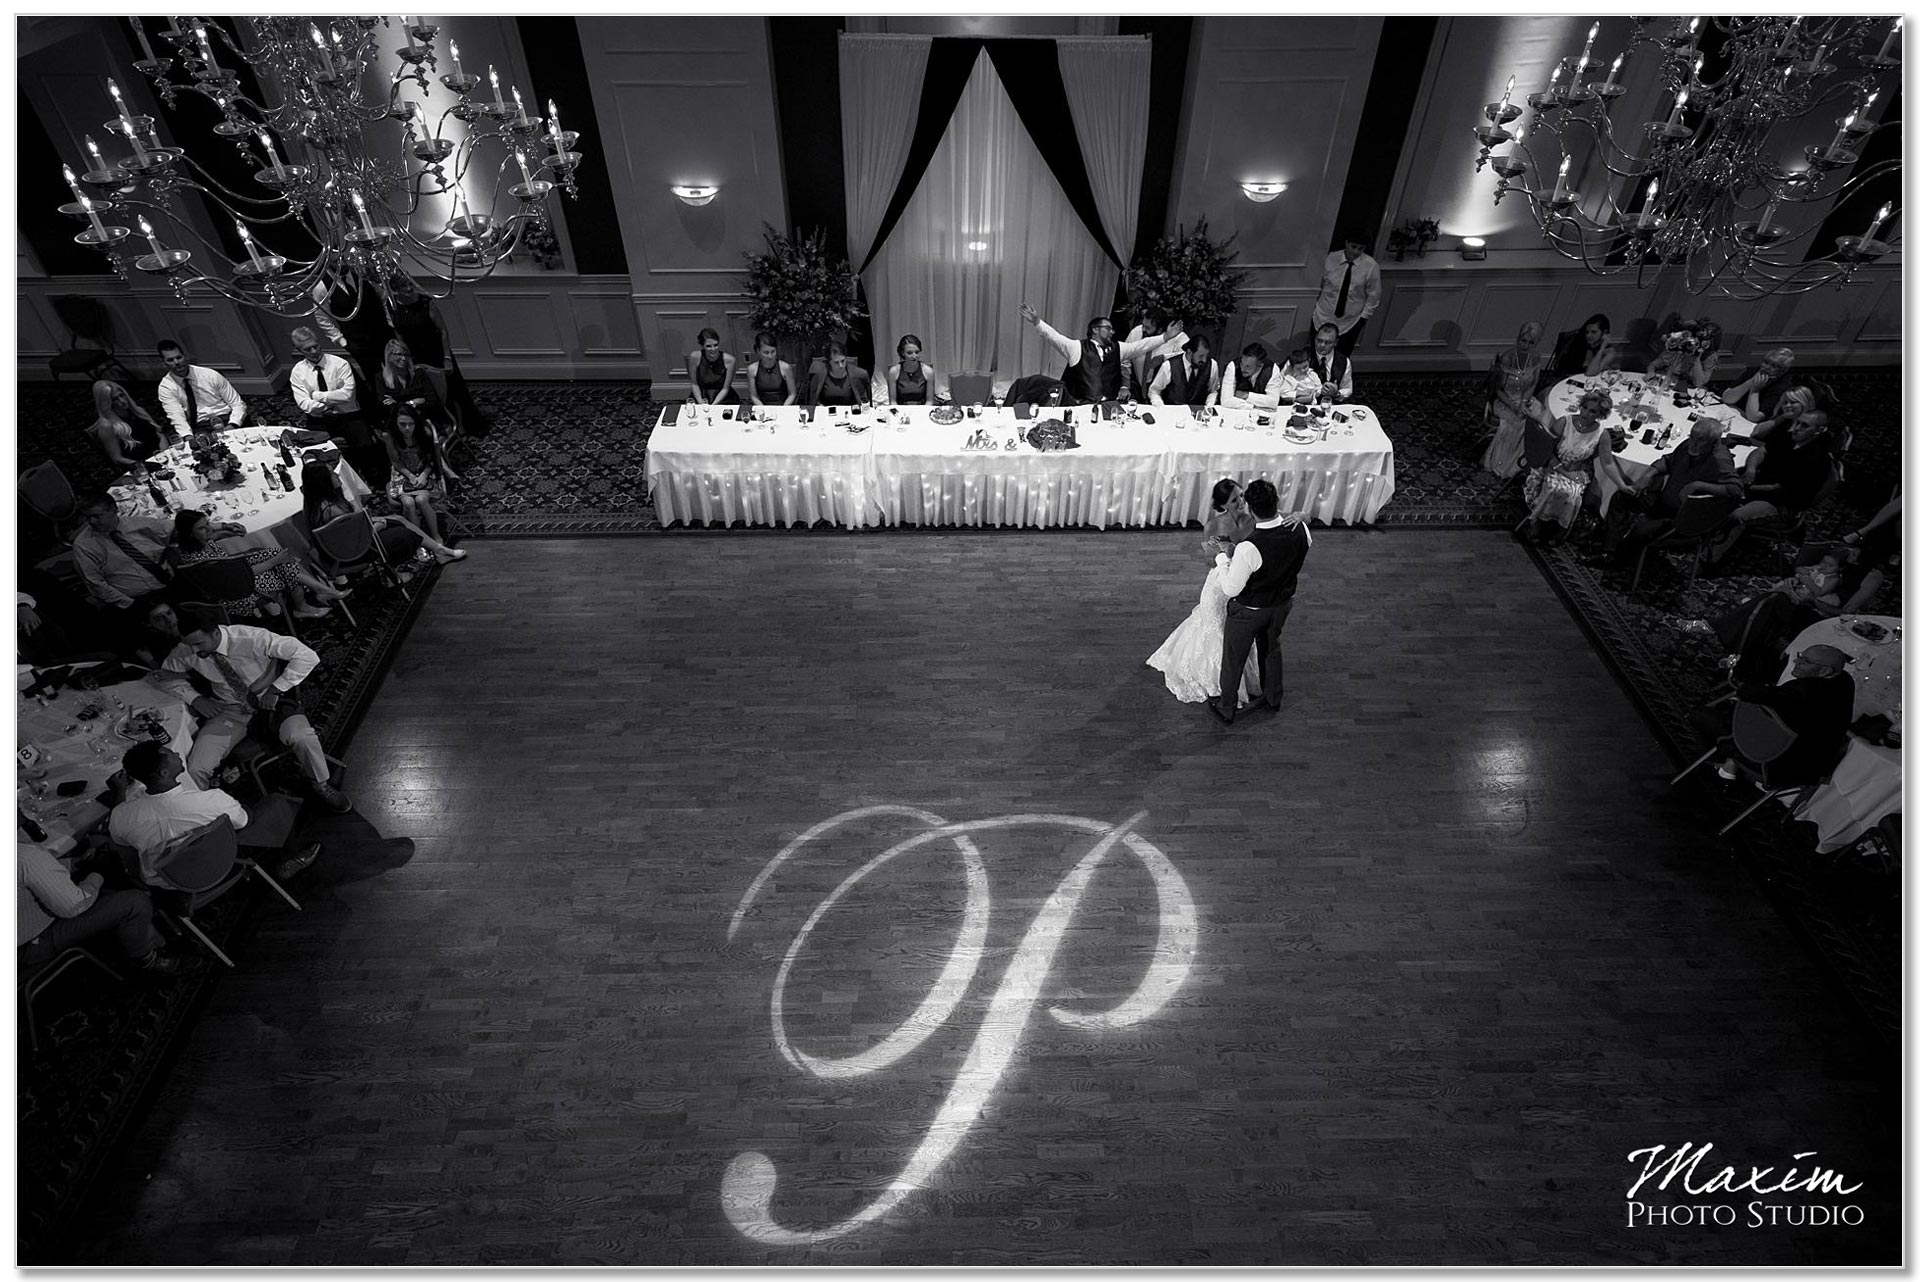 The Grand Ballroom Wedding Reception dancing